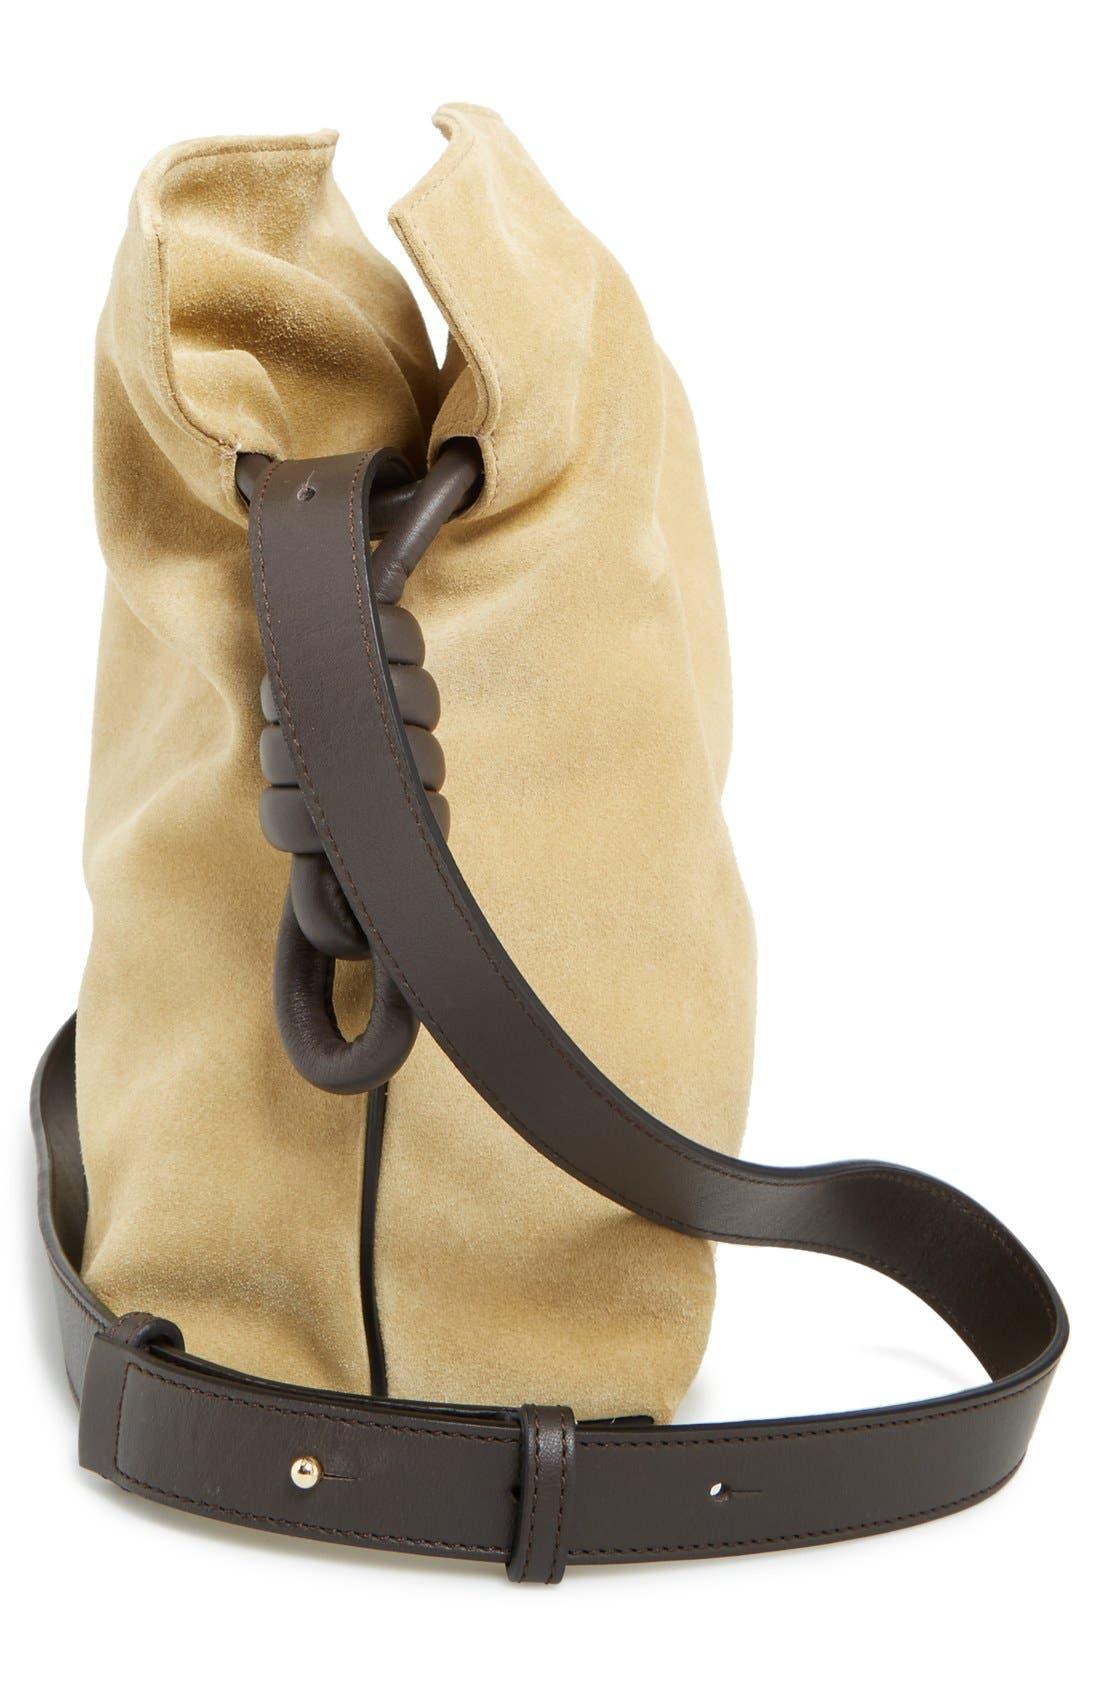 LOEWE, 'Flamenco Knot' Suede & Calfskin Leather Bag, Alternate thumbnail 3, color, 250